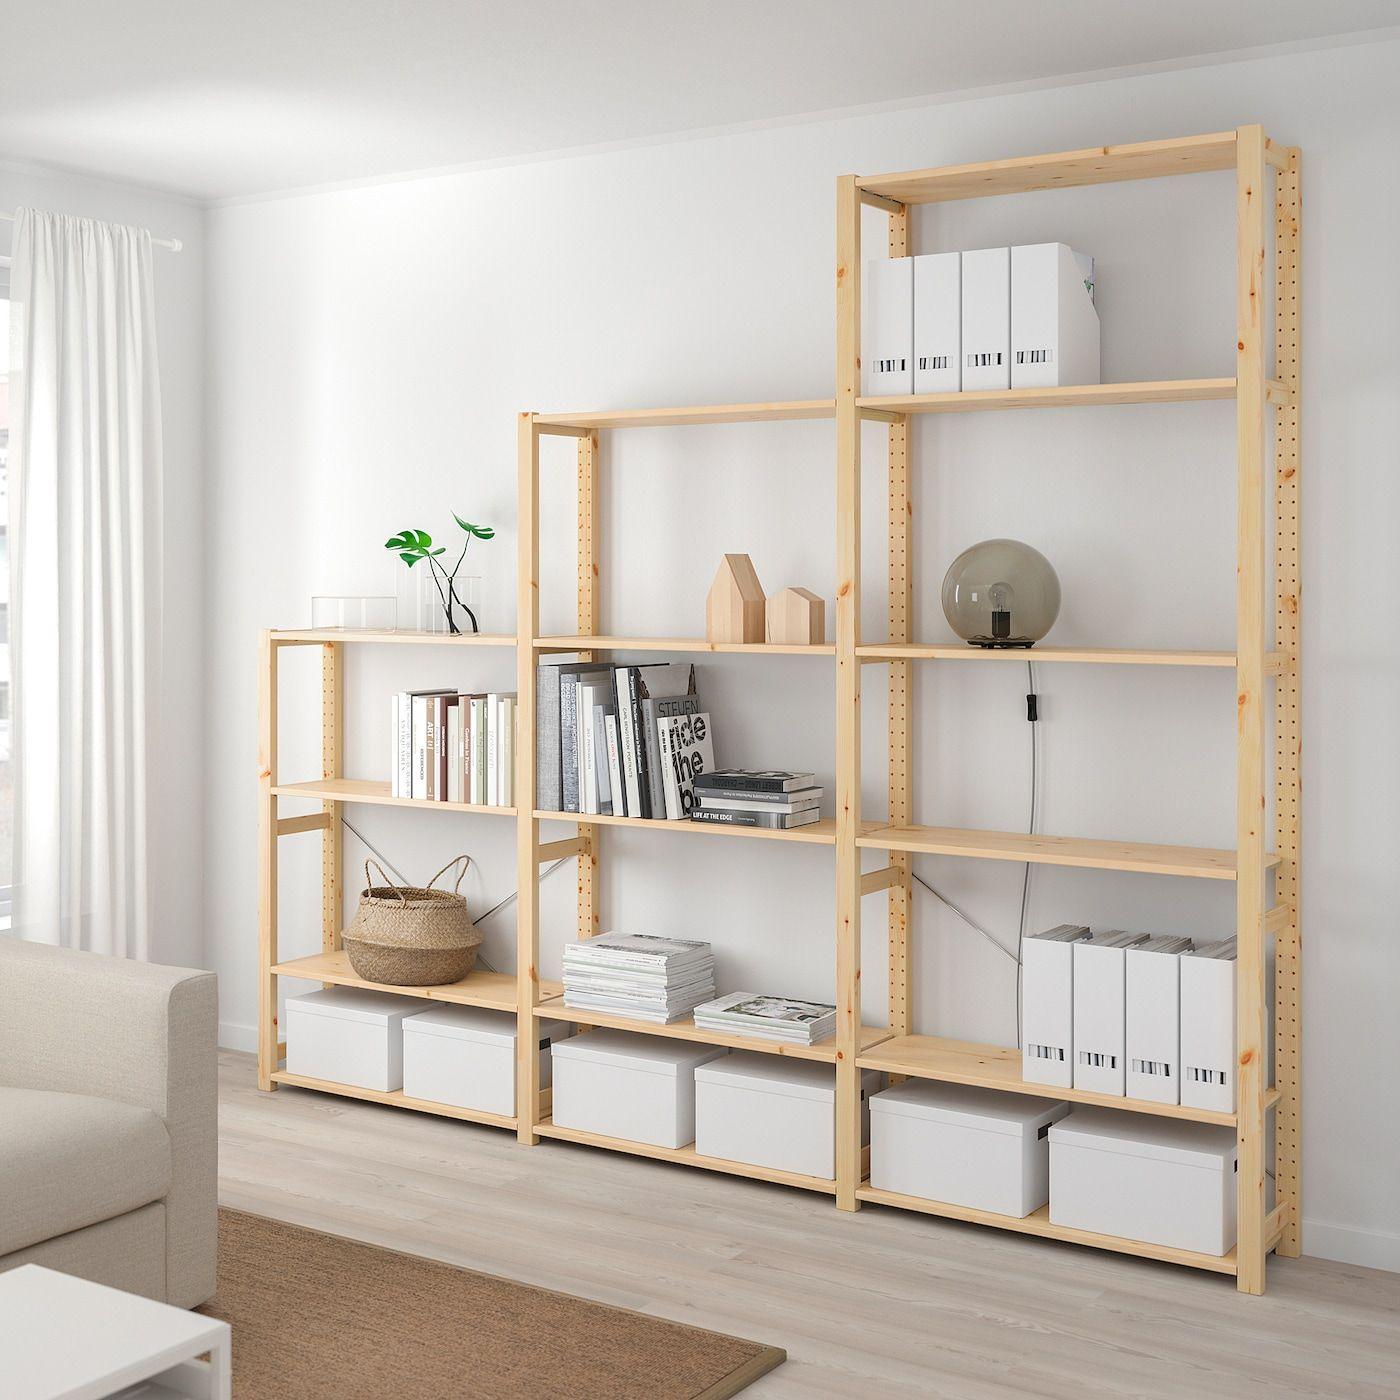 Ikea Ivar Pine 3 Section Shelving Unit In 2020 Cheap Shelving Units Wood Shelving Units Wall Shelving Units